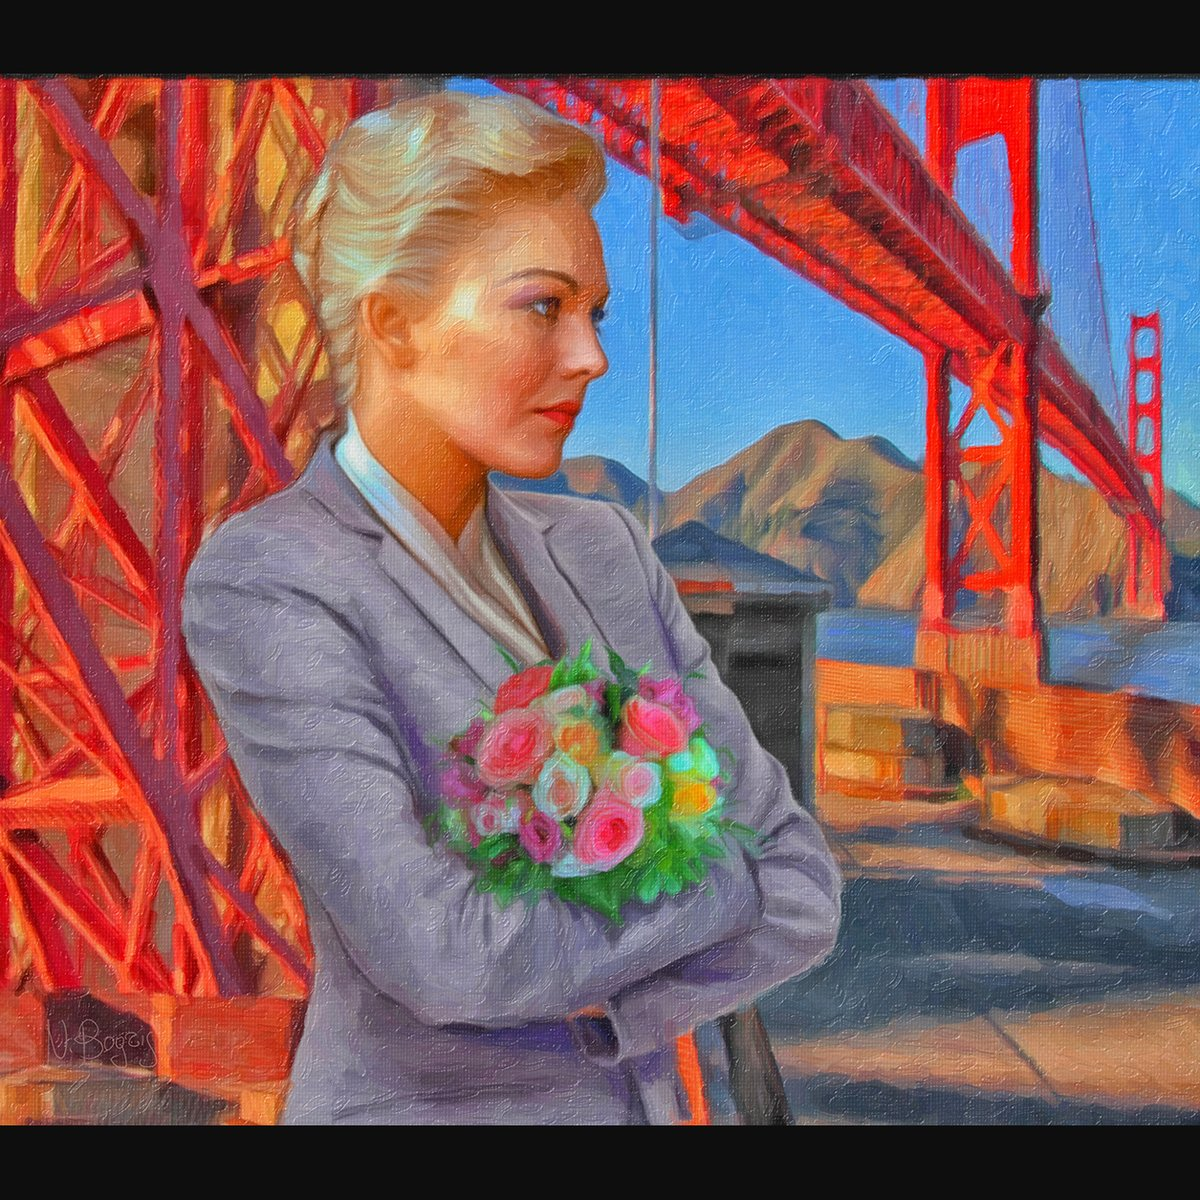 Madeleine (2020) . Commision, oil painting inspired by the Alfred Hitchcock masterpiece film #Vertigo . #oilpainting #illustration #art #artist #poster #painter #絵 #design #painting  #artwork #film #print #KimNovak  #illustrator #portrait #drawing #그림 #SanFrancisco #Hitchcock pic.twitter.com/5dAyglIExV